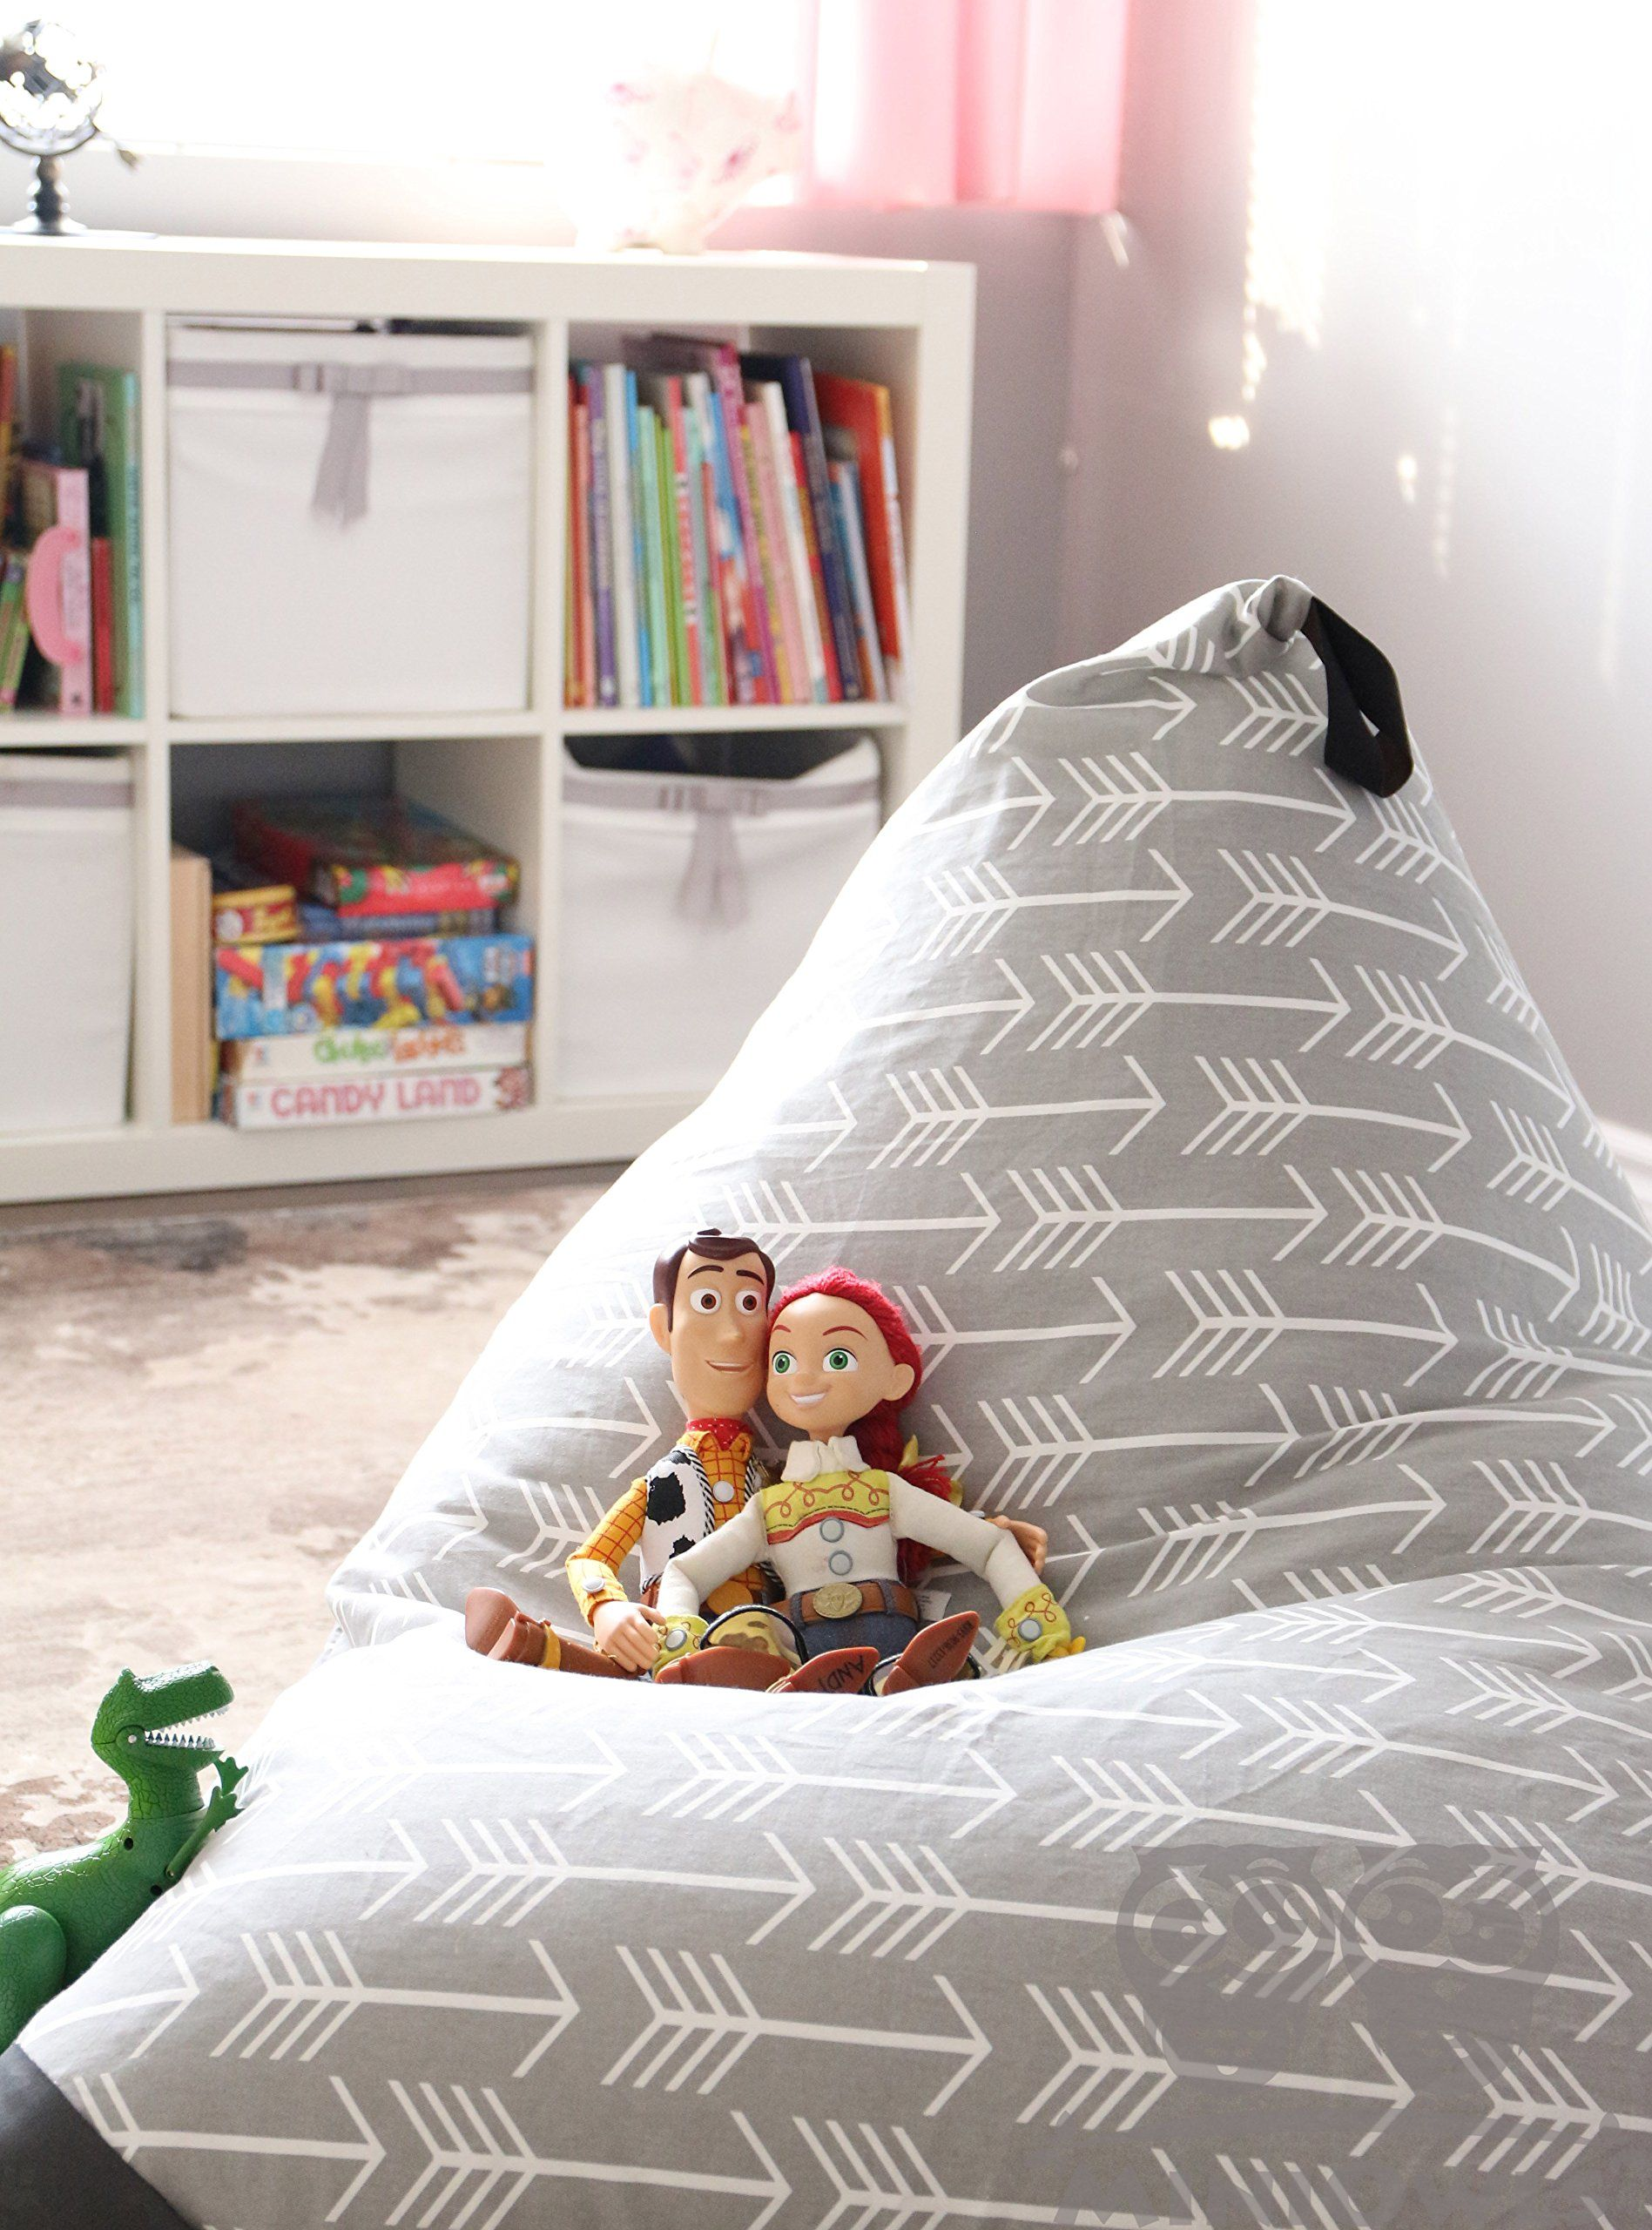 Miniowls toy storage bean bag cover fits 200l52 gal